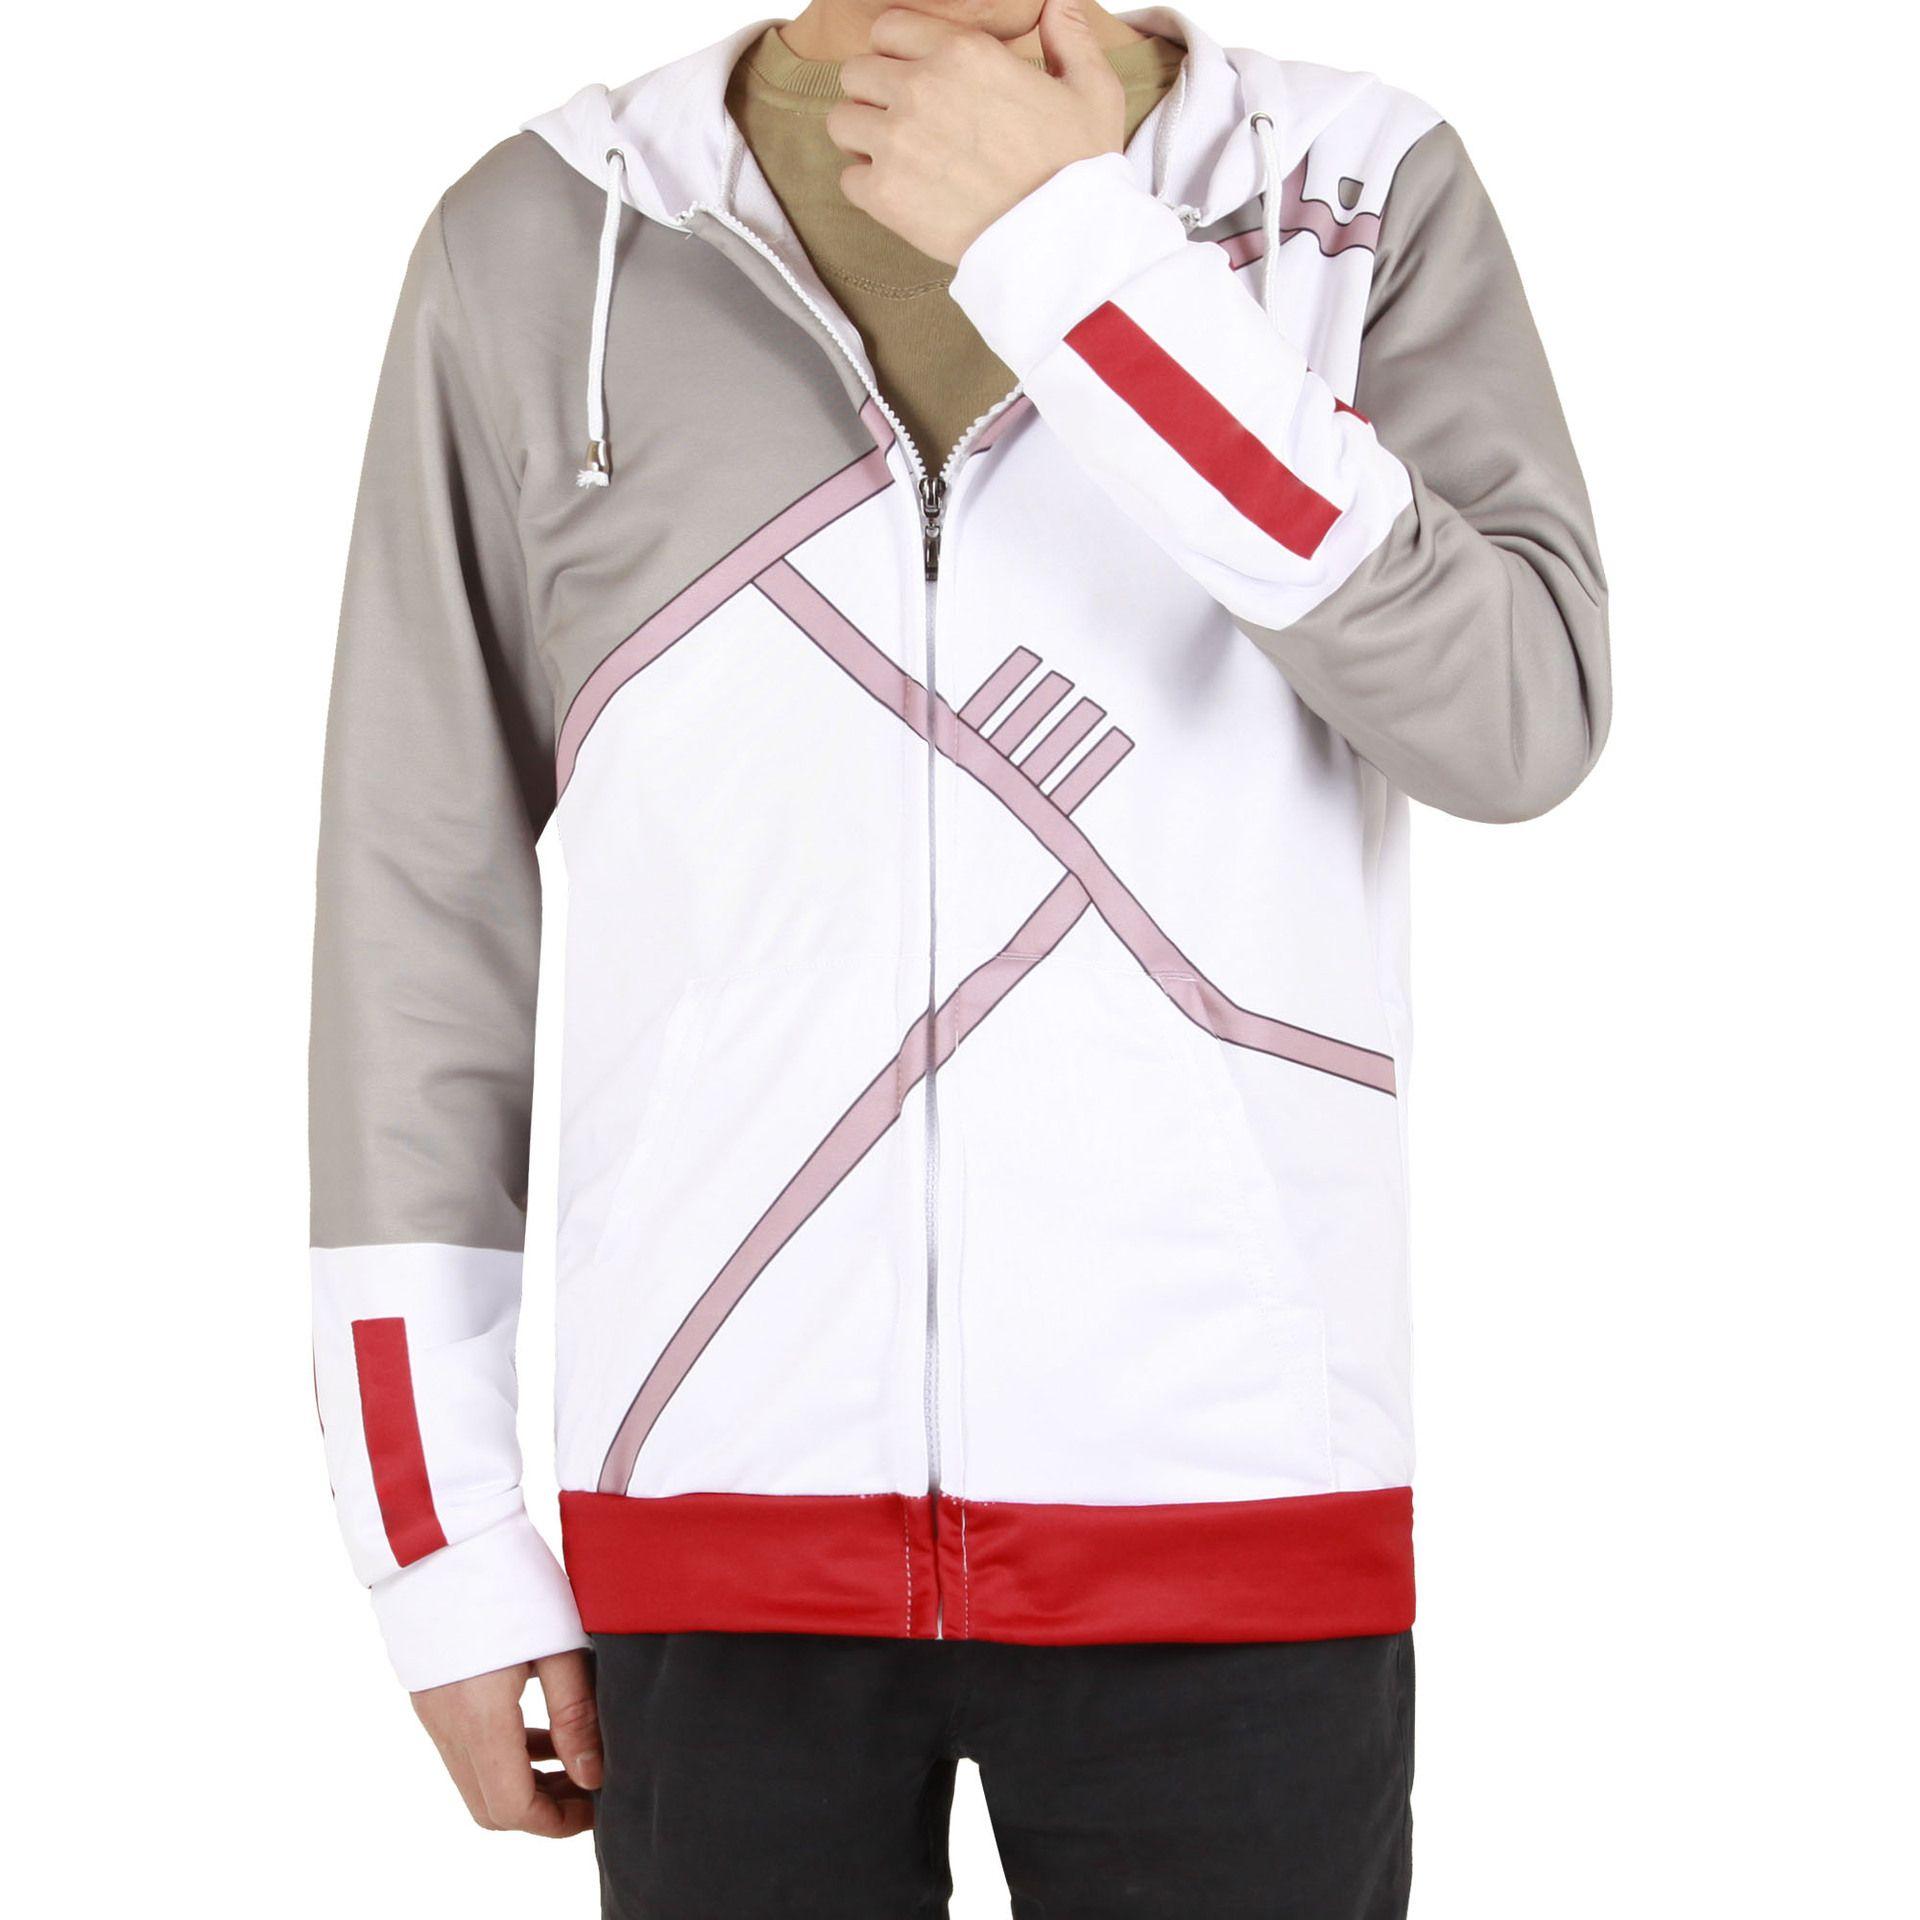 Tamaño asiático Japón Anime Naruto de manga larga de Halloween Cosplay informal traje deportivo Unisex Coat Jacket Hoodie